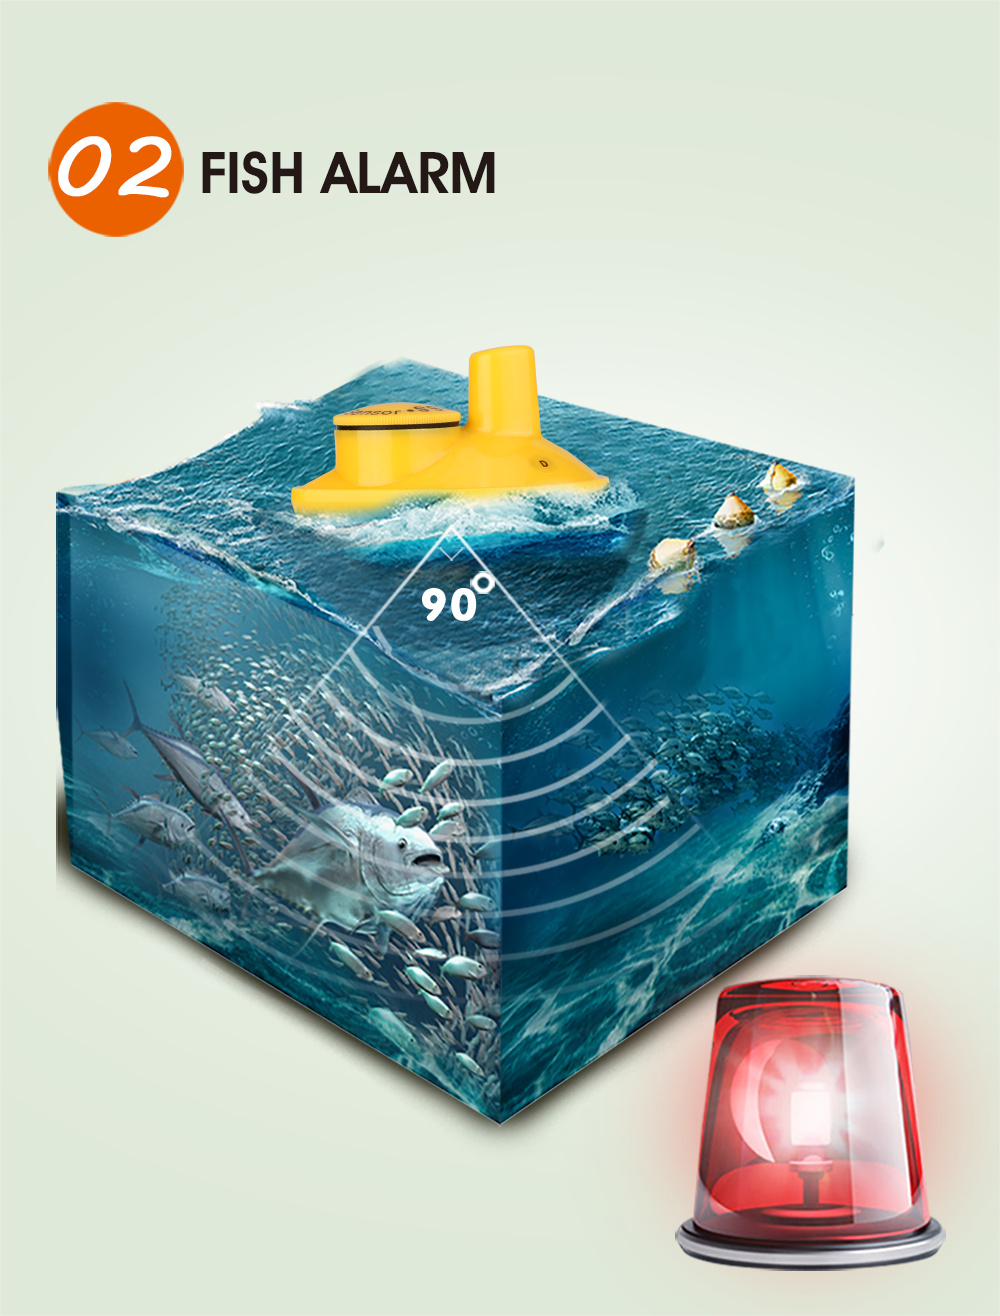 Portátil findfish sonar sem fio inventor de